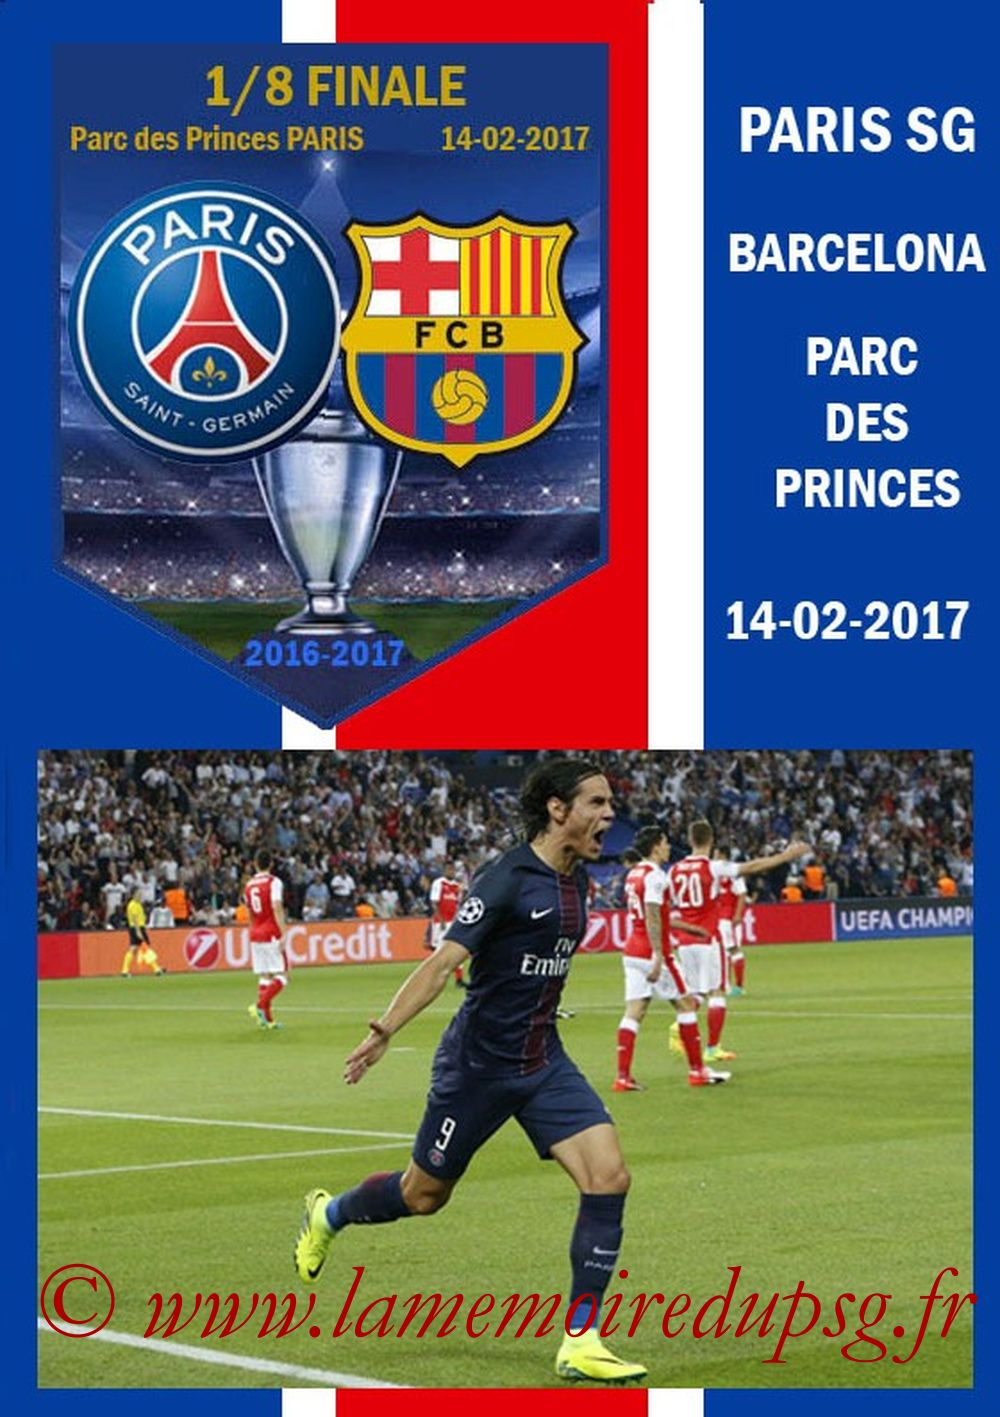 2017-02-14  PSG-Barcelone (8ème C1 aller, Programme pirate 2)